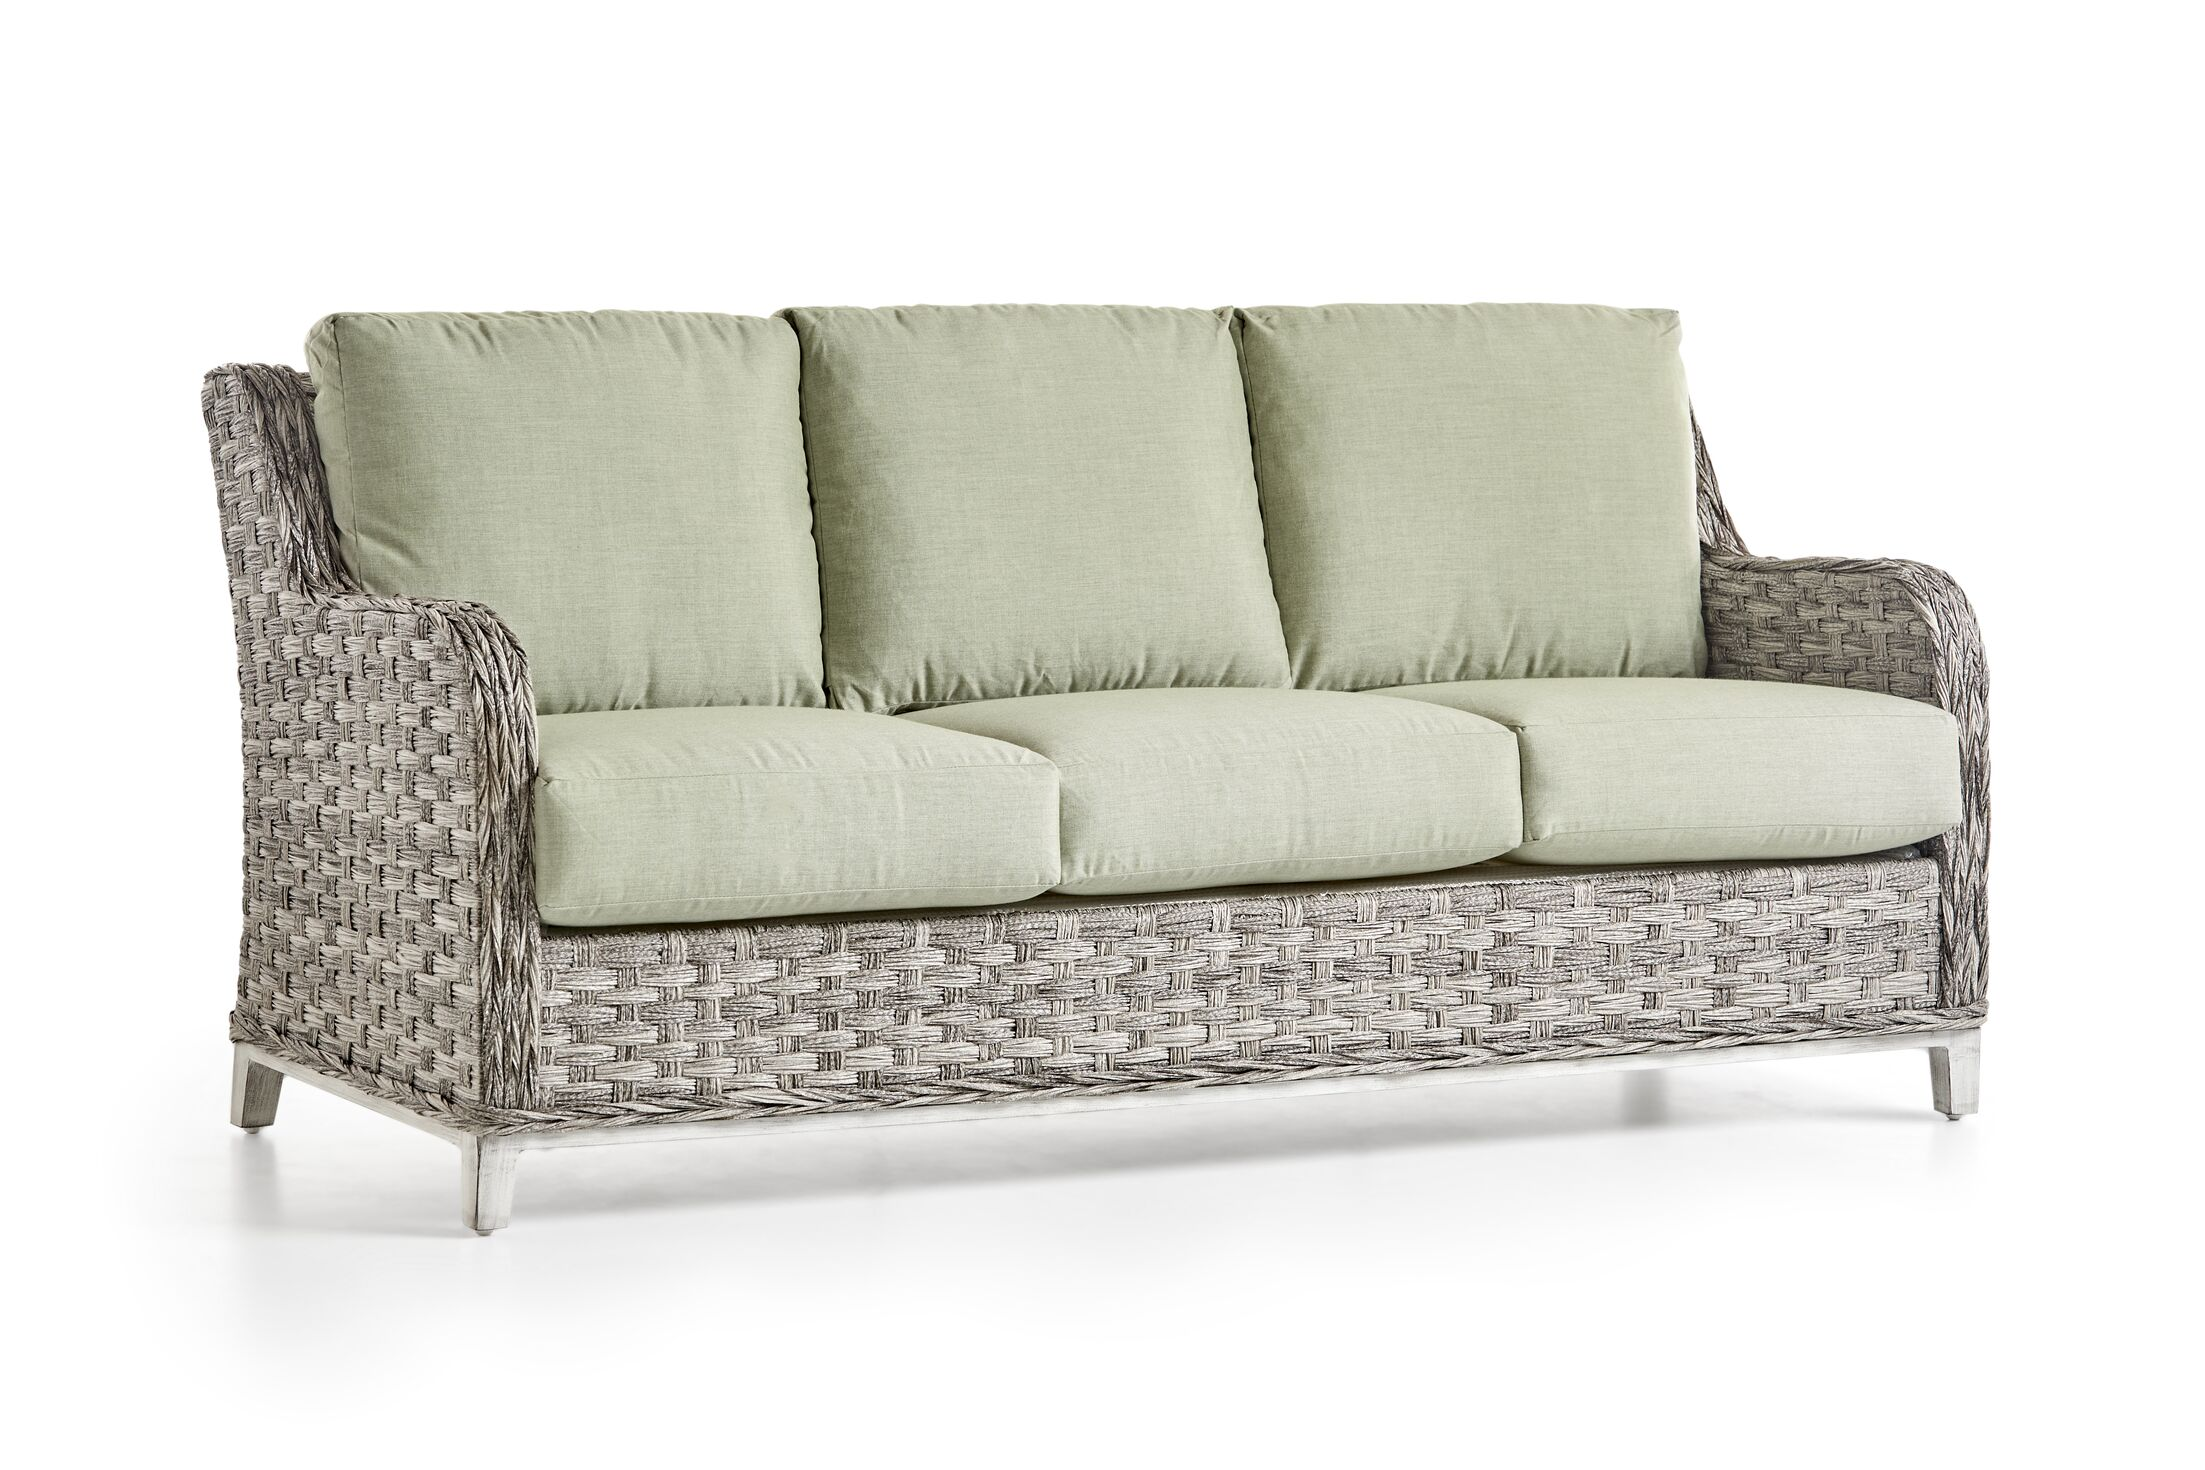 Cape Lookout Patio Sofa With Cushions Cushion Color: Canvas Crimson